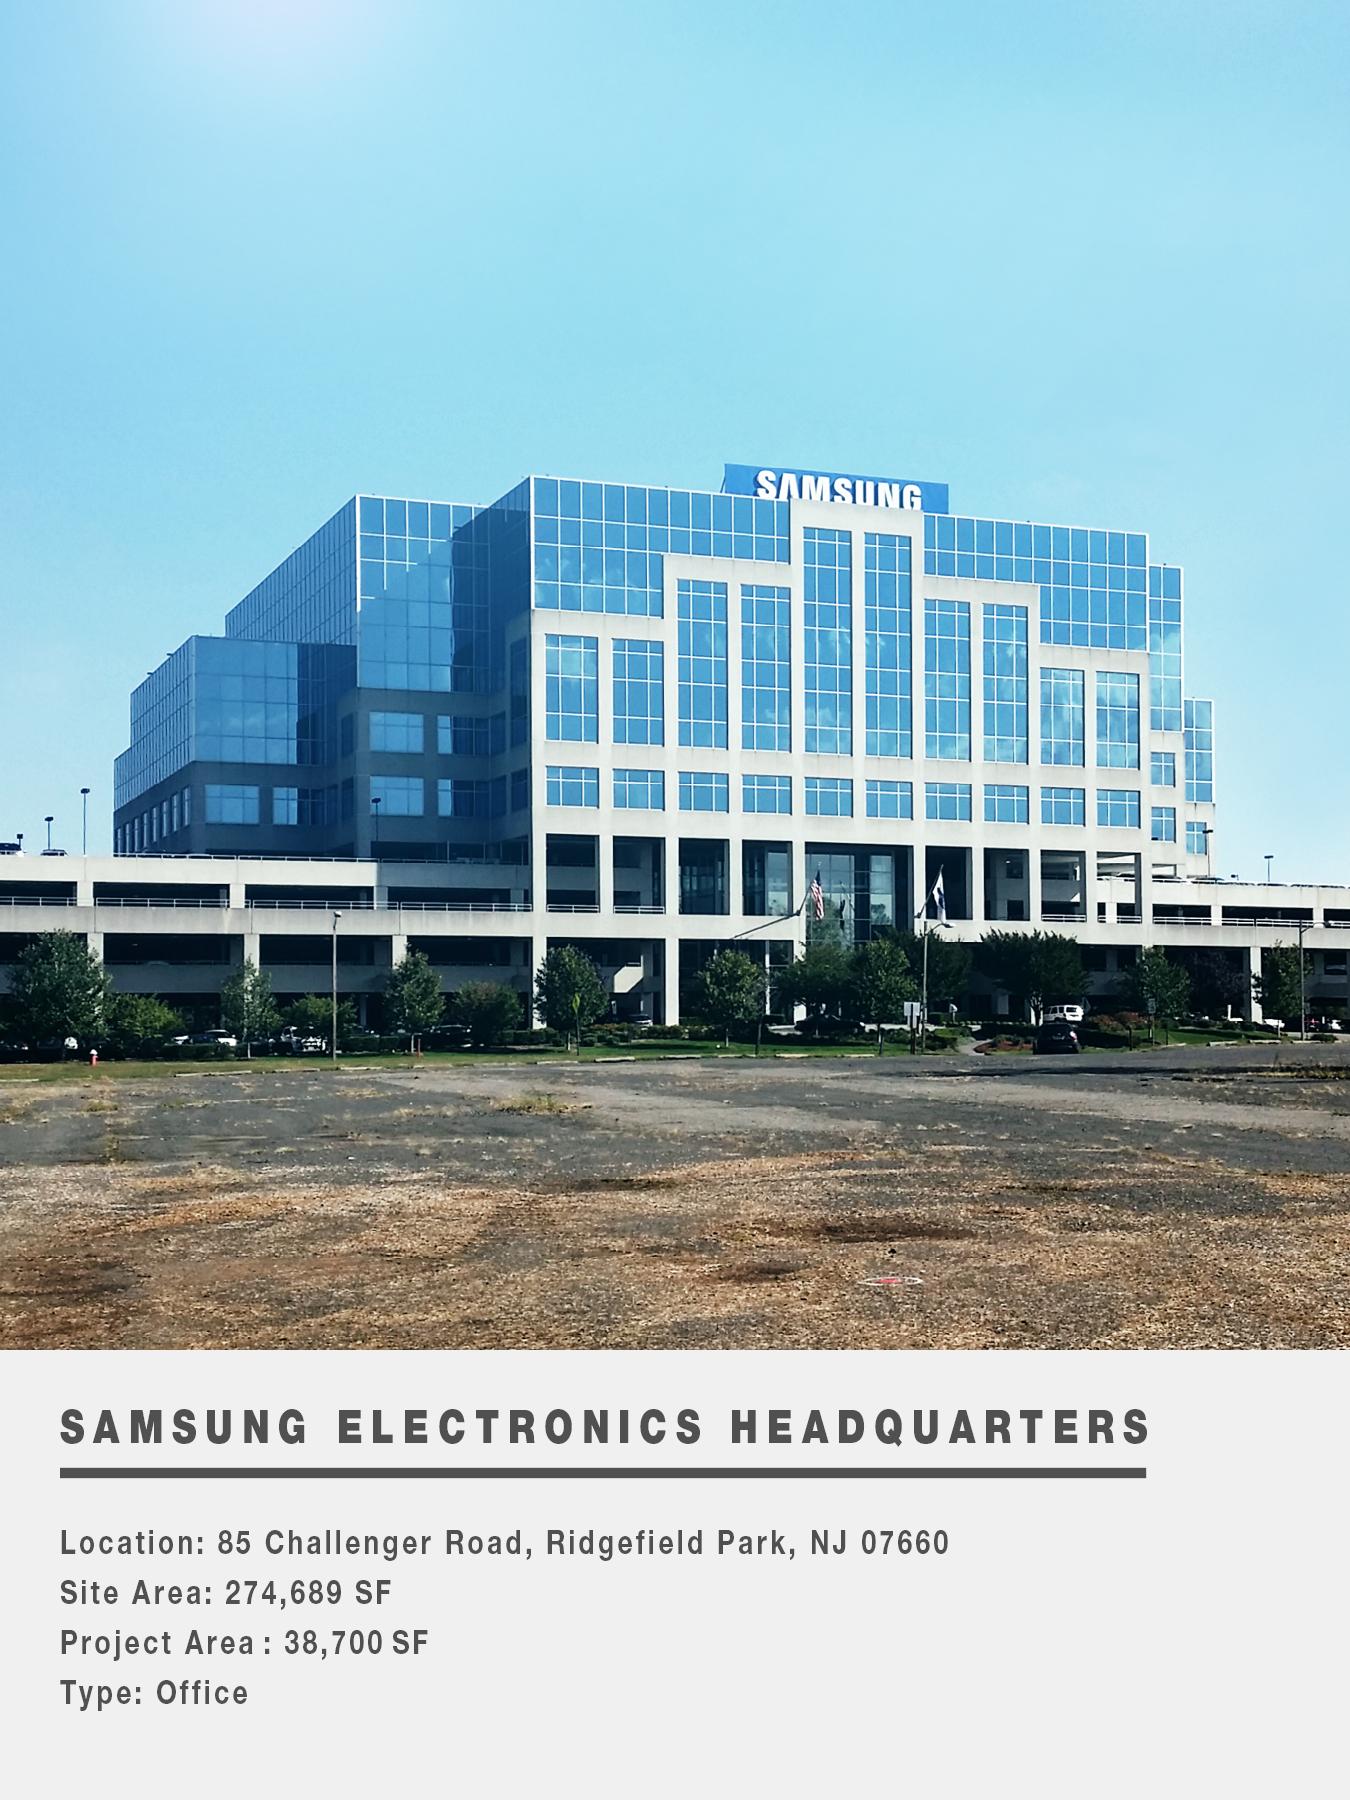 SAMSUNG ELECTRONICS HEADQUARTERS